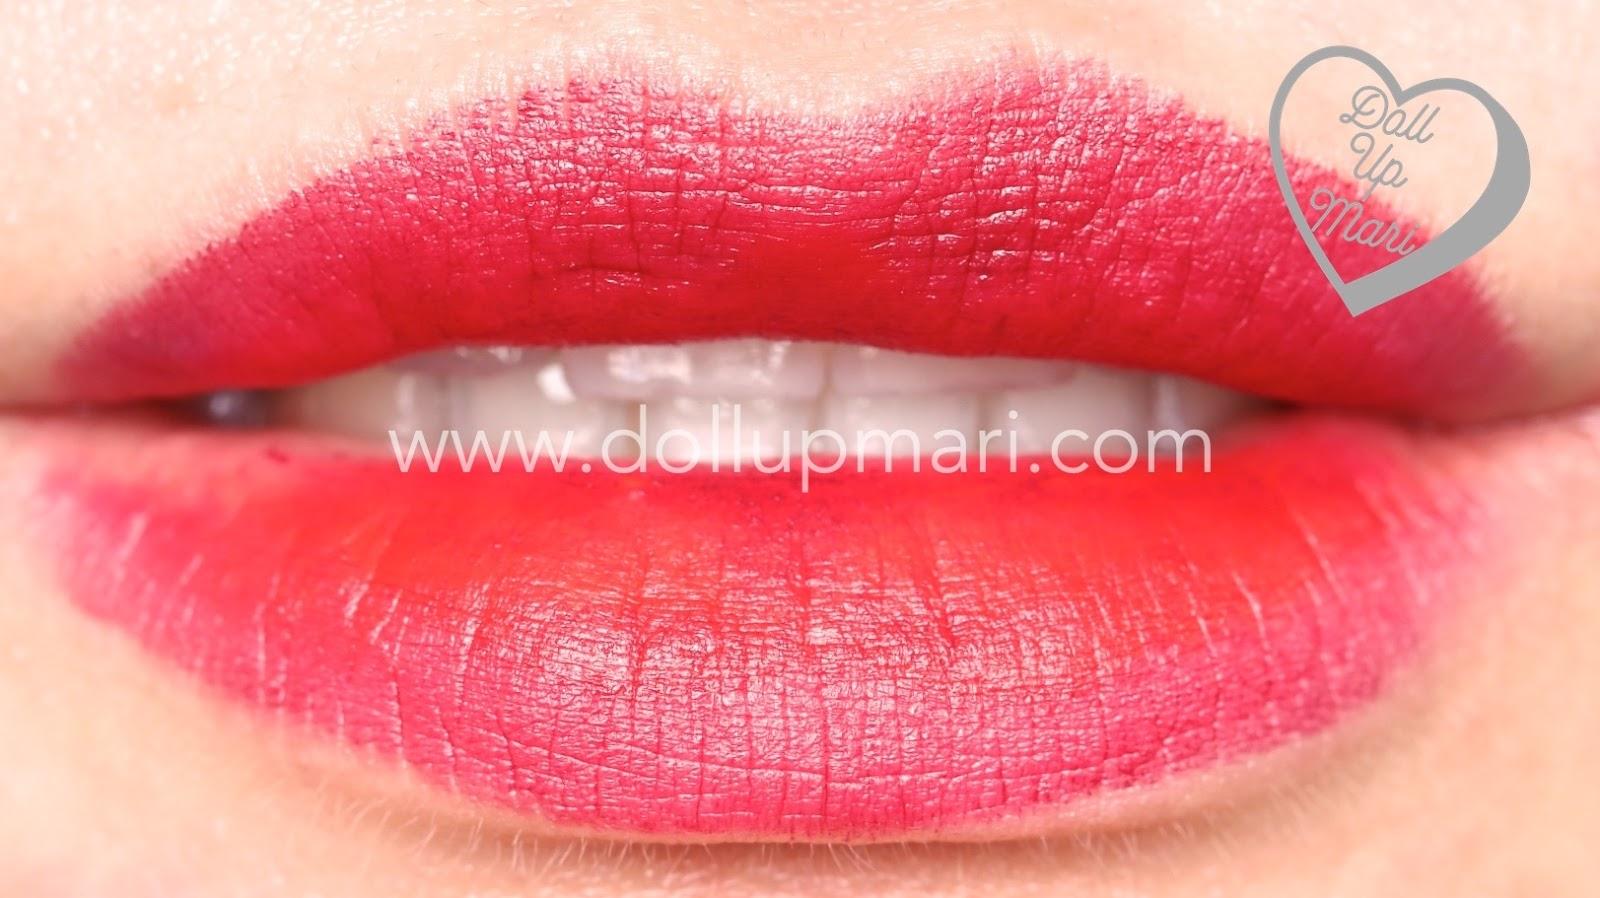 lip swatch of Wild Cherry shade of AVON Perfectly Matte Lipstick